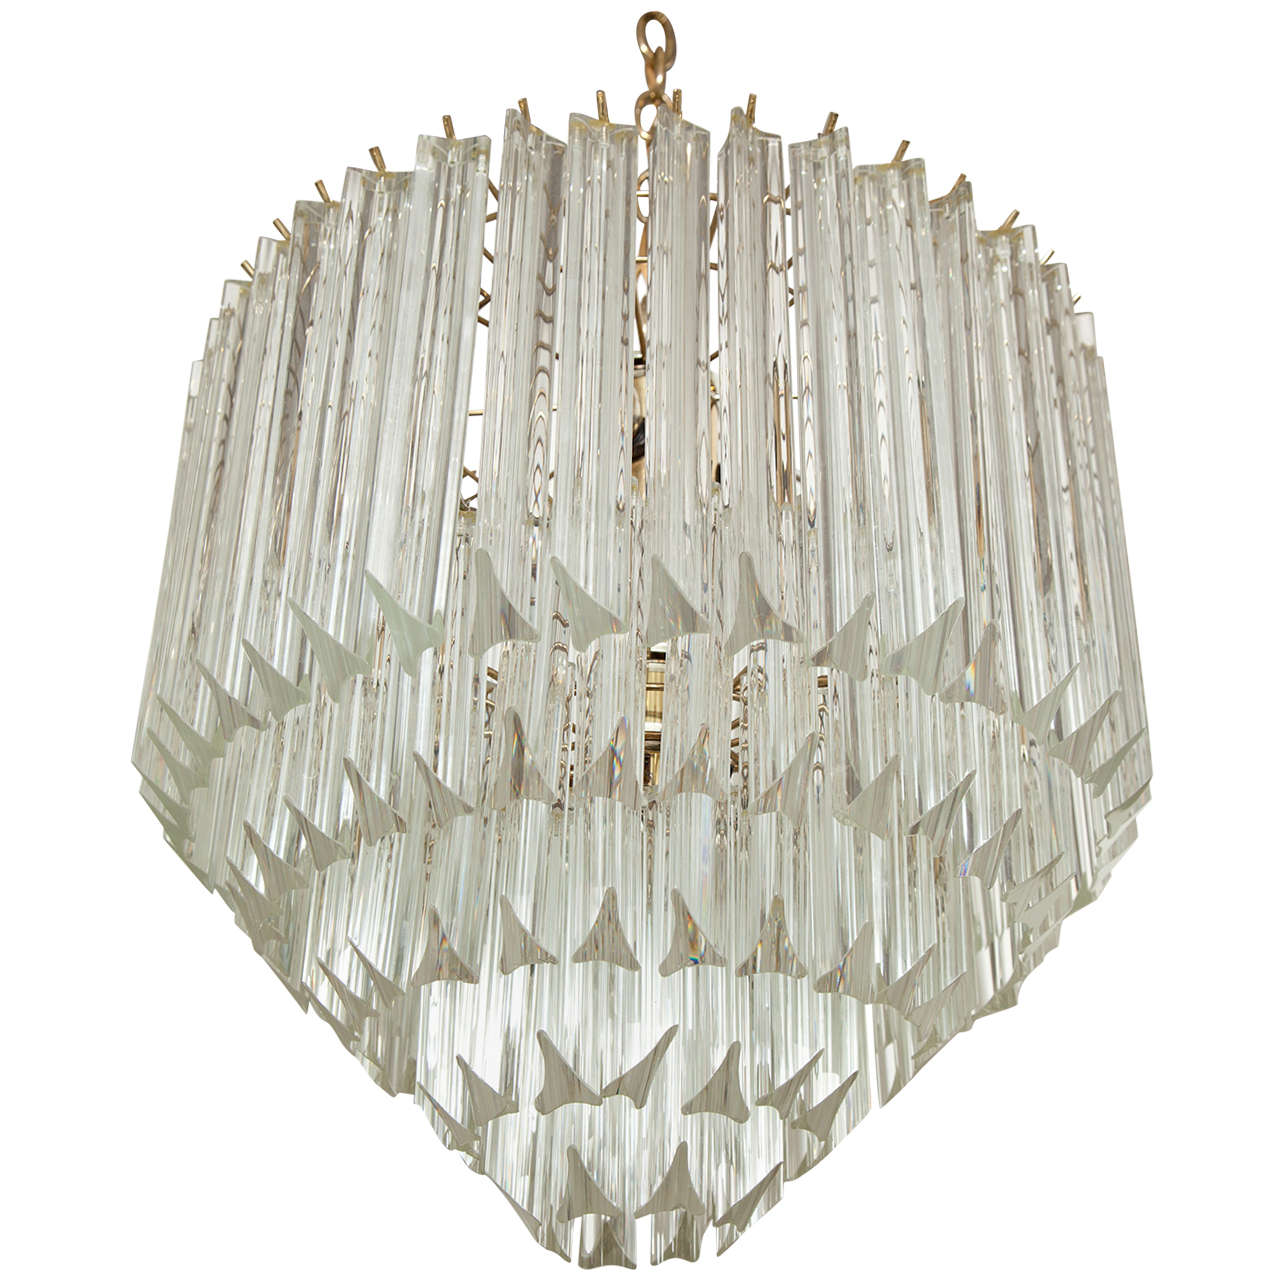 chandeliers lamp white led mount ceiling crystal light design fixture vintage bronze modern lights lighting shades fixtures lovely in otbsiu semi chandelier flush of